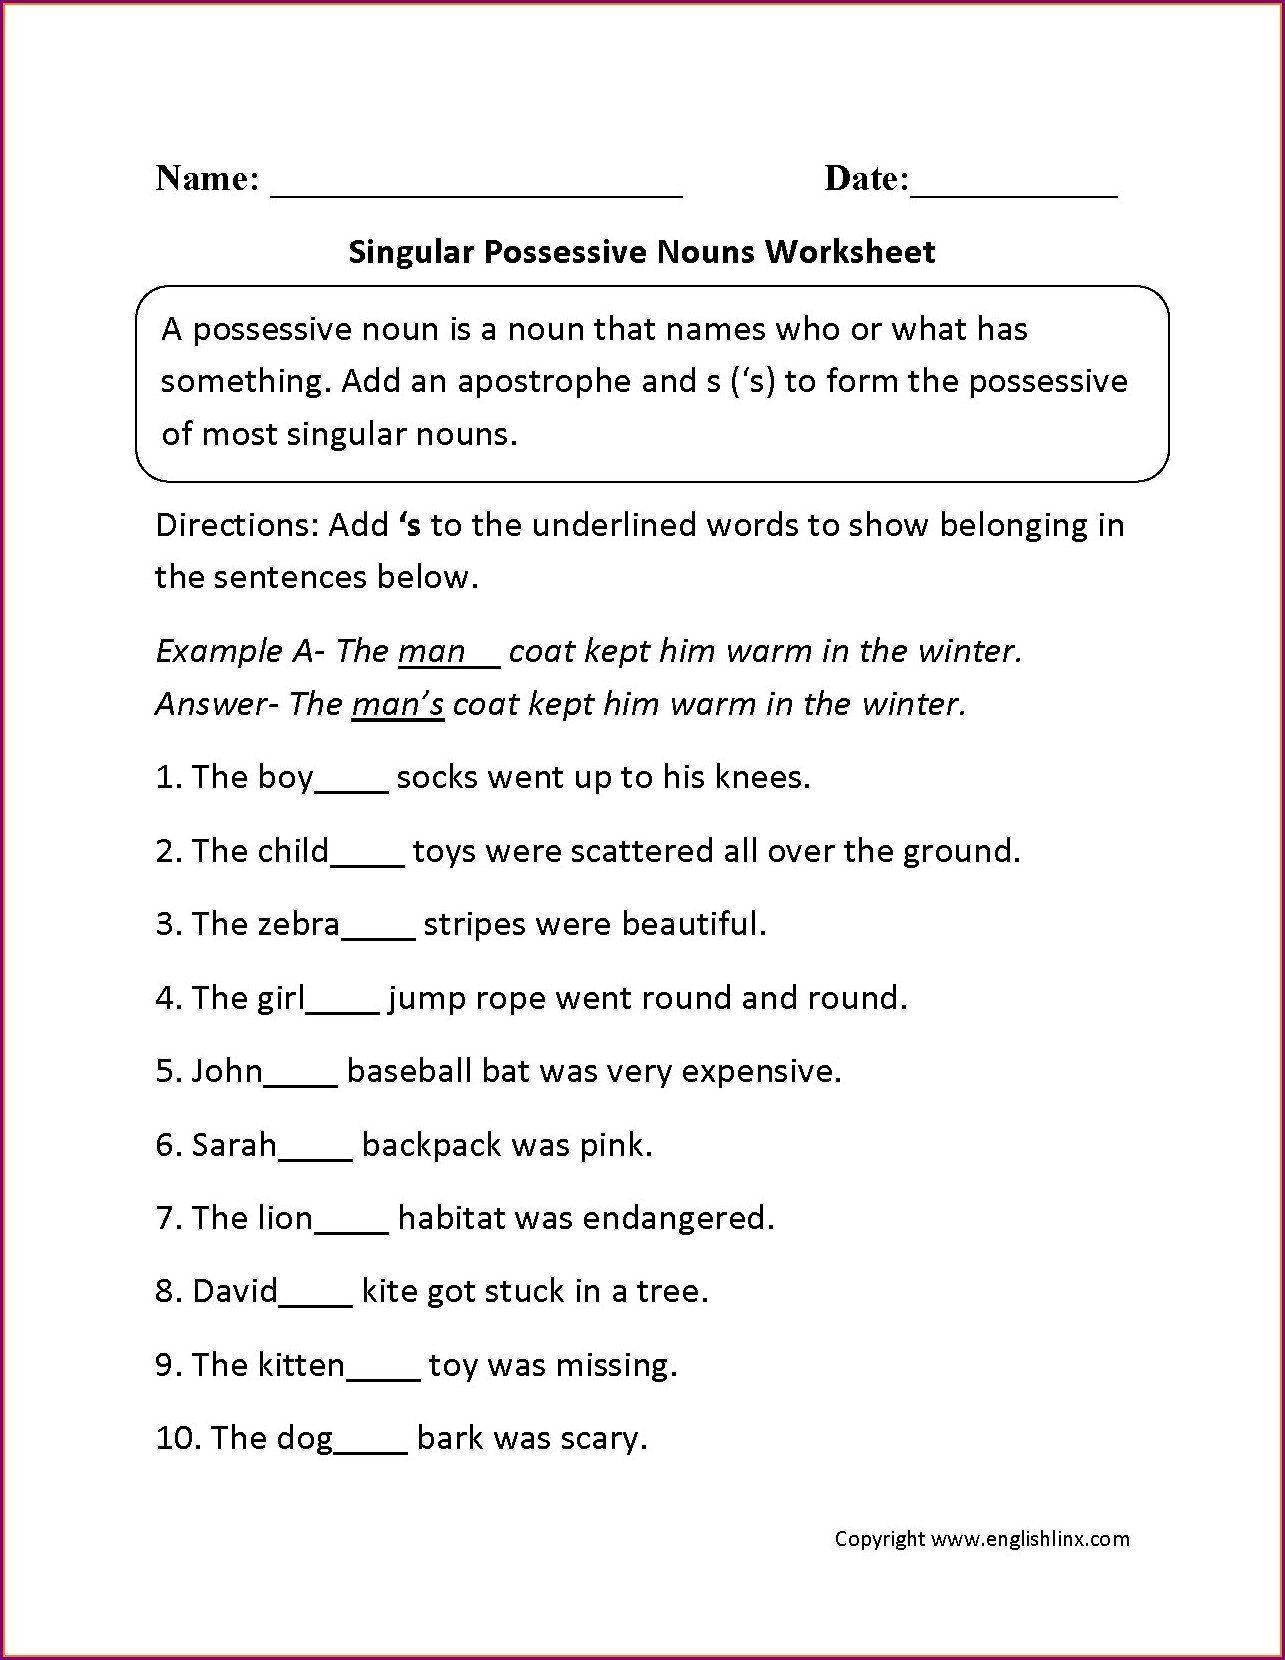 Possessive Noun Worksheets Middle School Possessive Nouns Worksheets Elementary Possessive Nouns Worksheets Possessive Nouns Nouns Worksheet